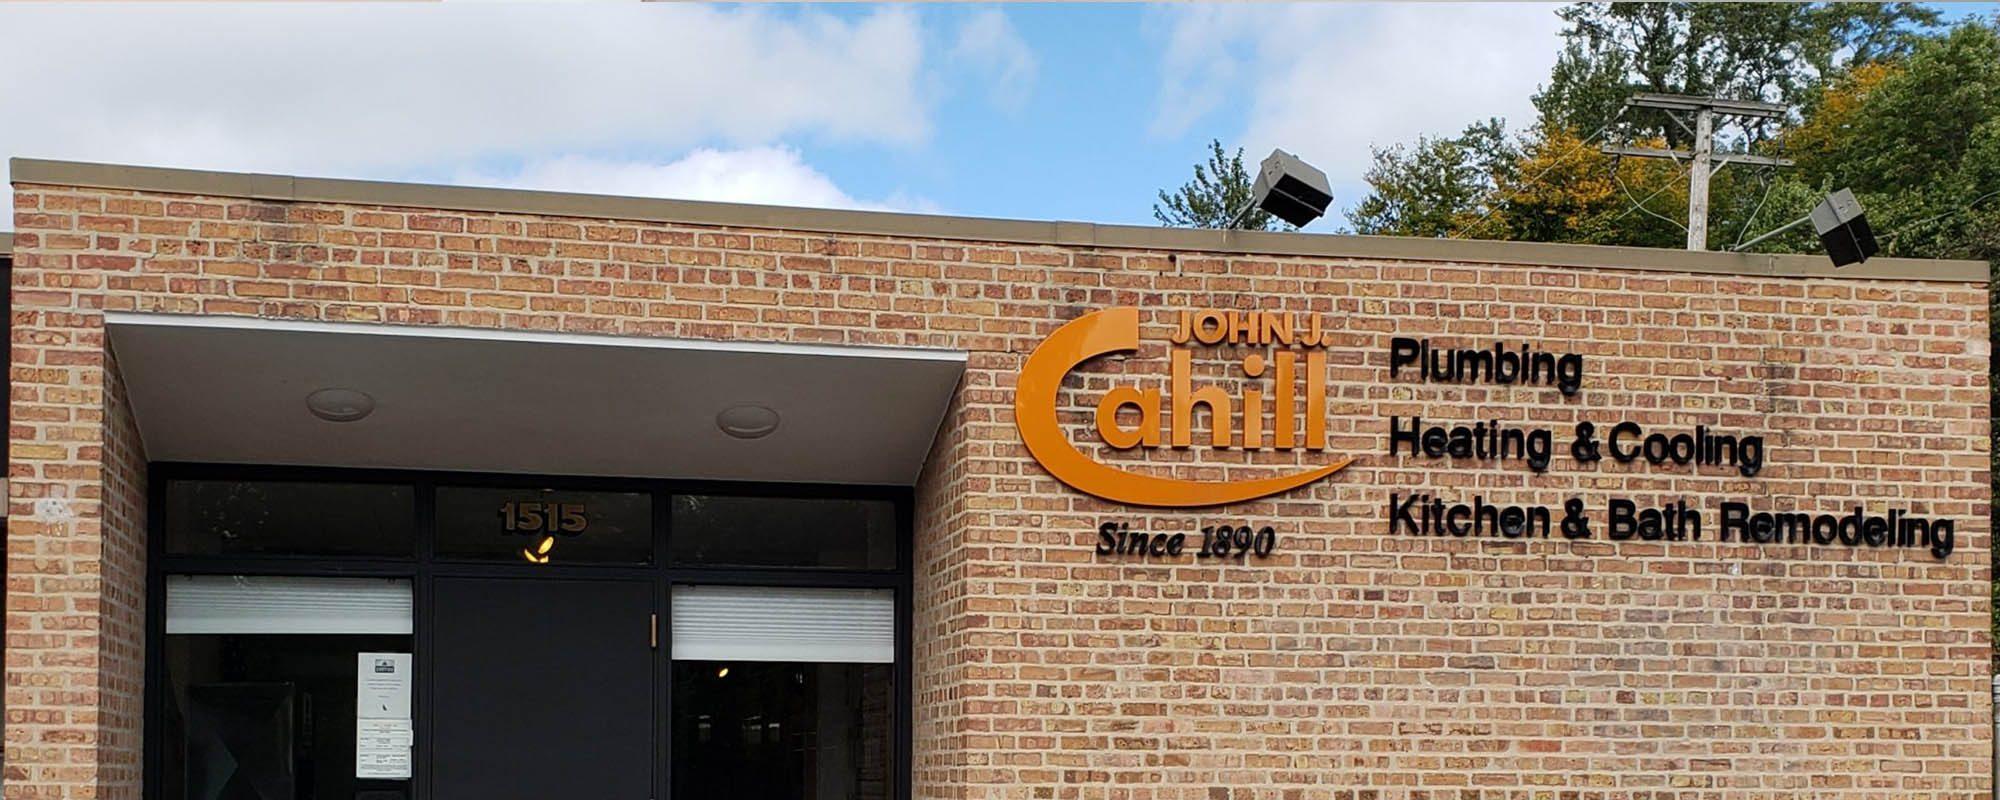 John J. Cahill Inc. Banner